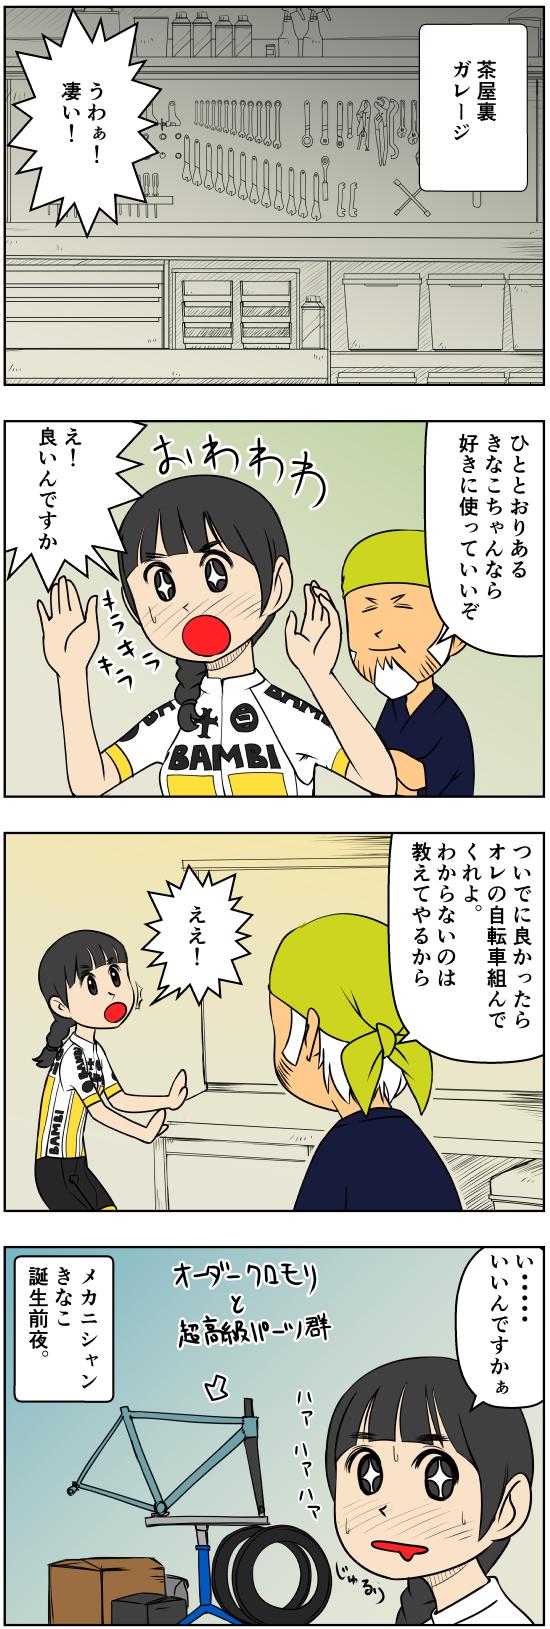 sansyokudanngochan-36-73.jpg